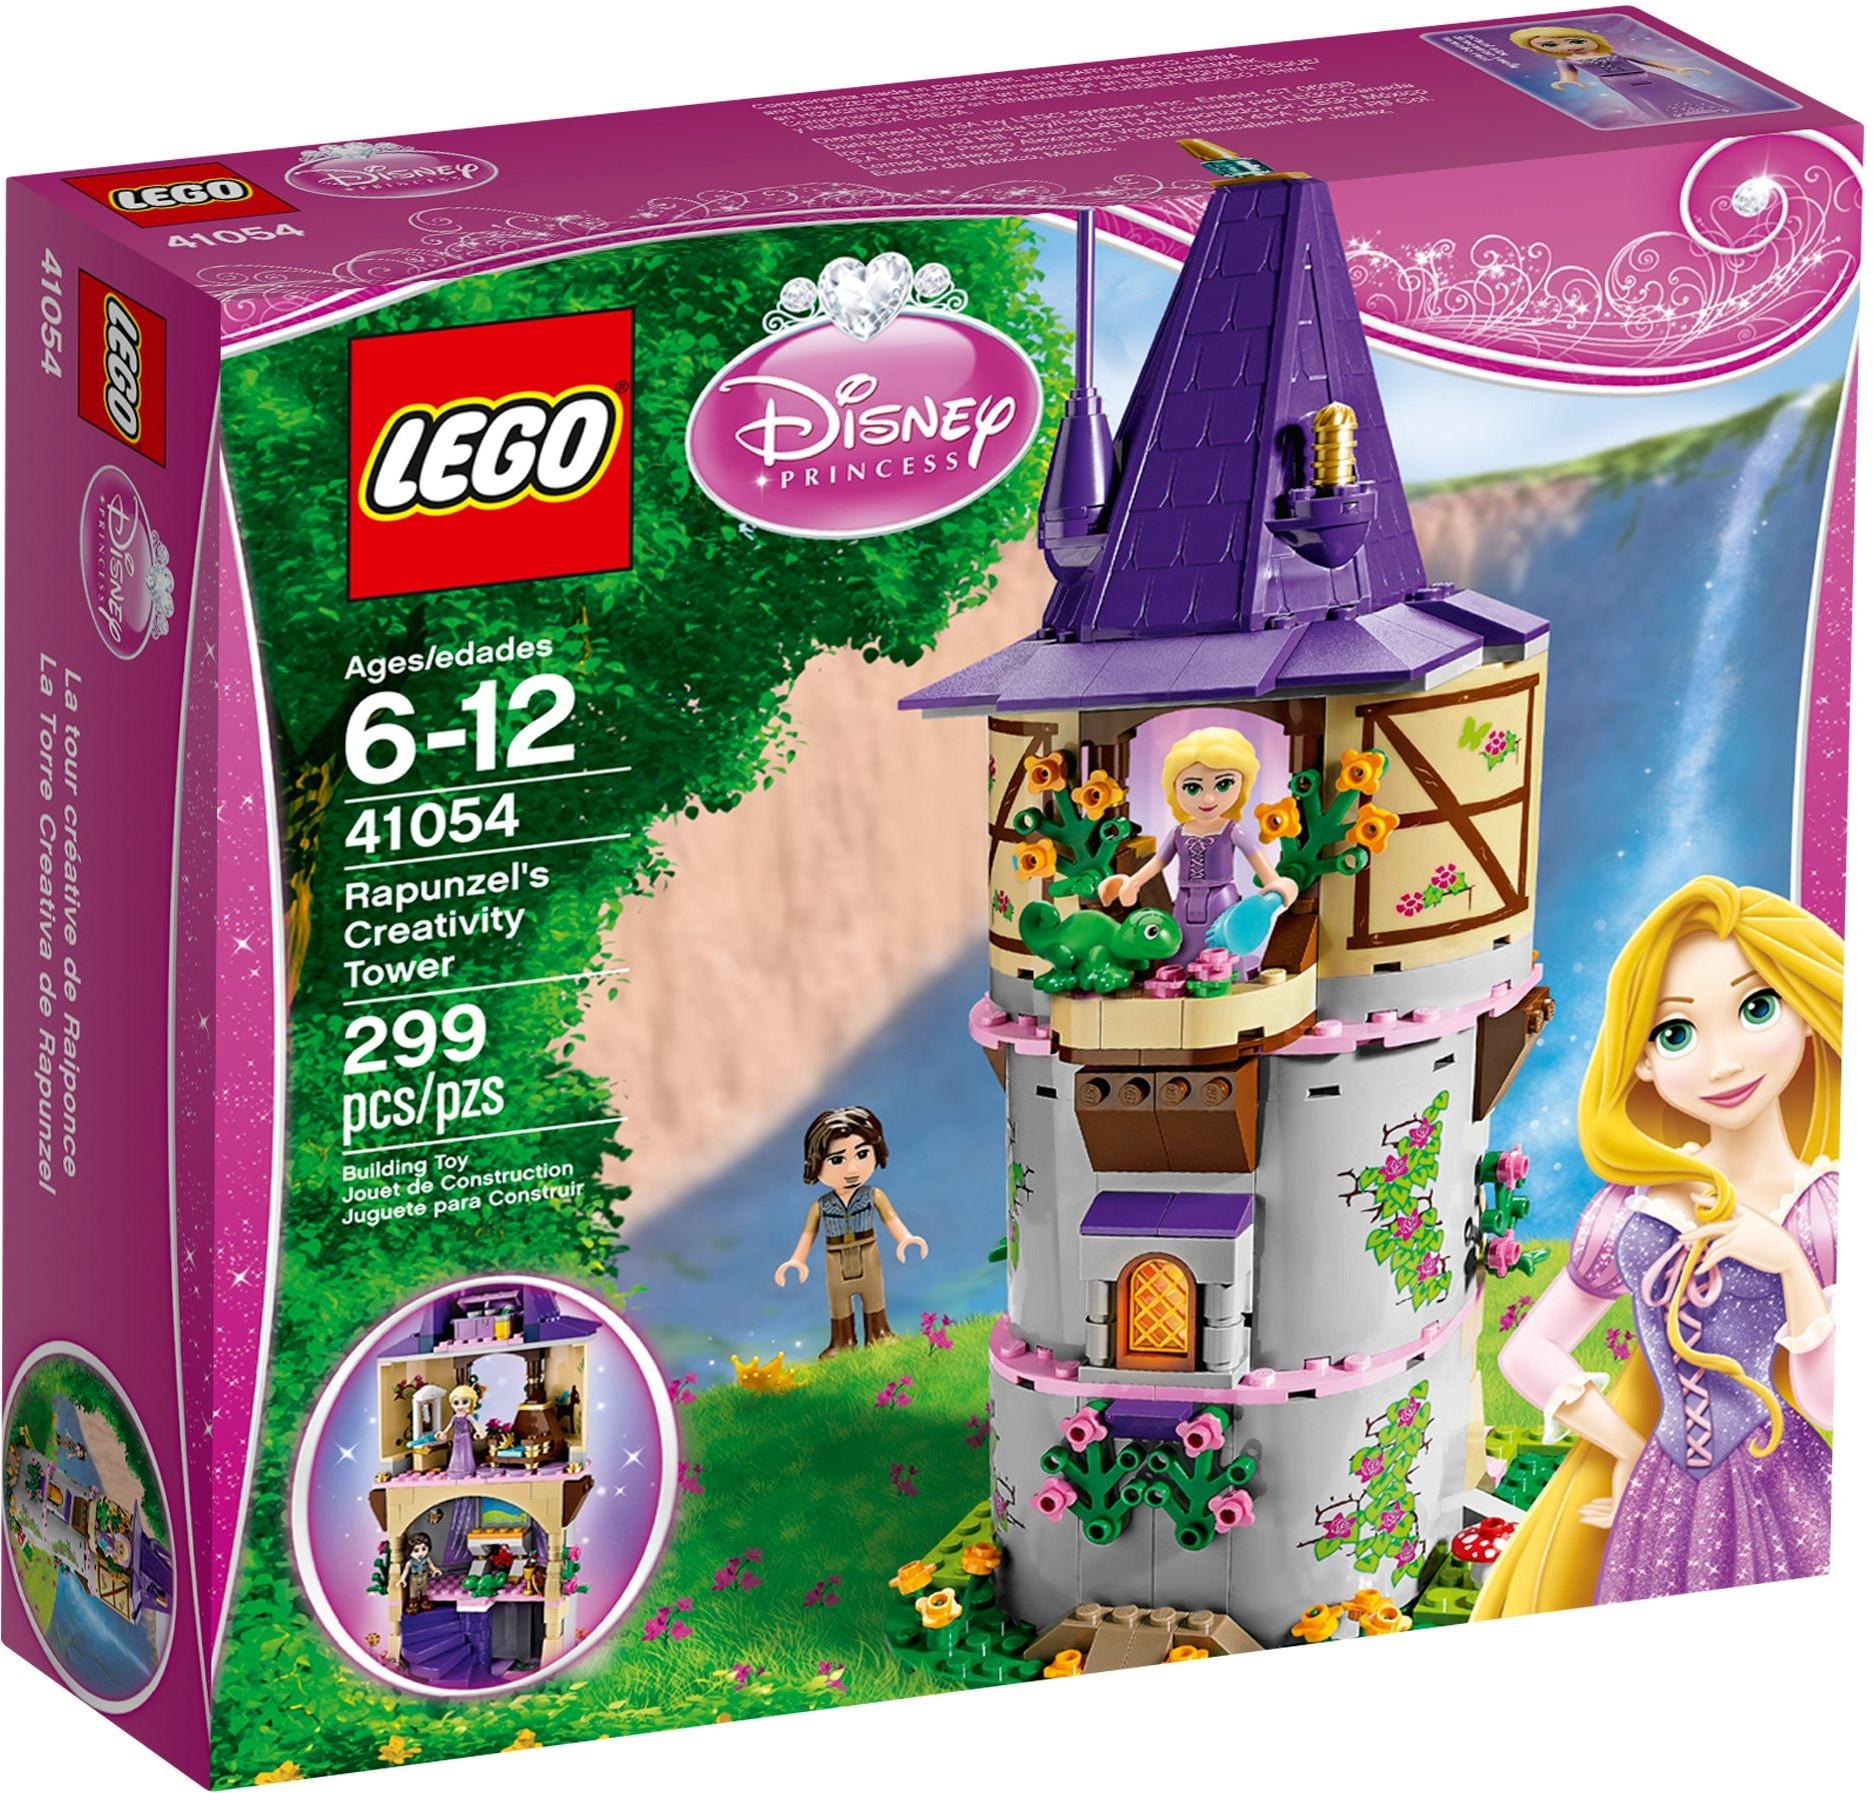 LEGO 41054 - Disney Princess - Rapunzel's Creativity Tower